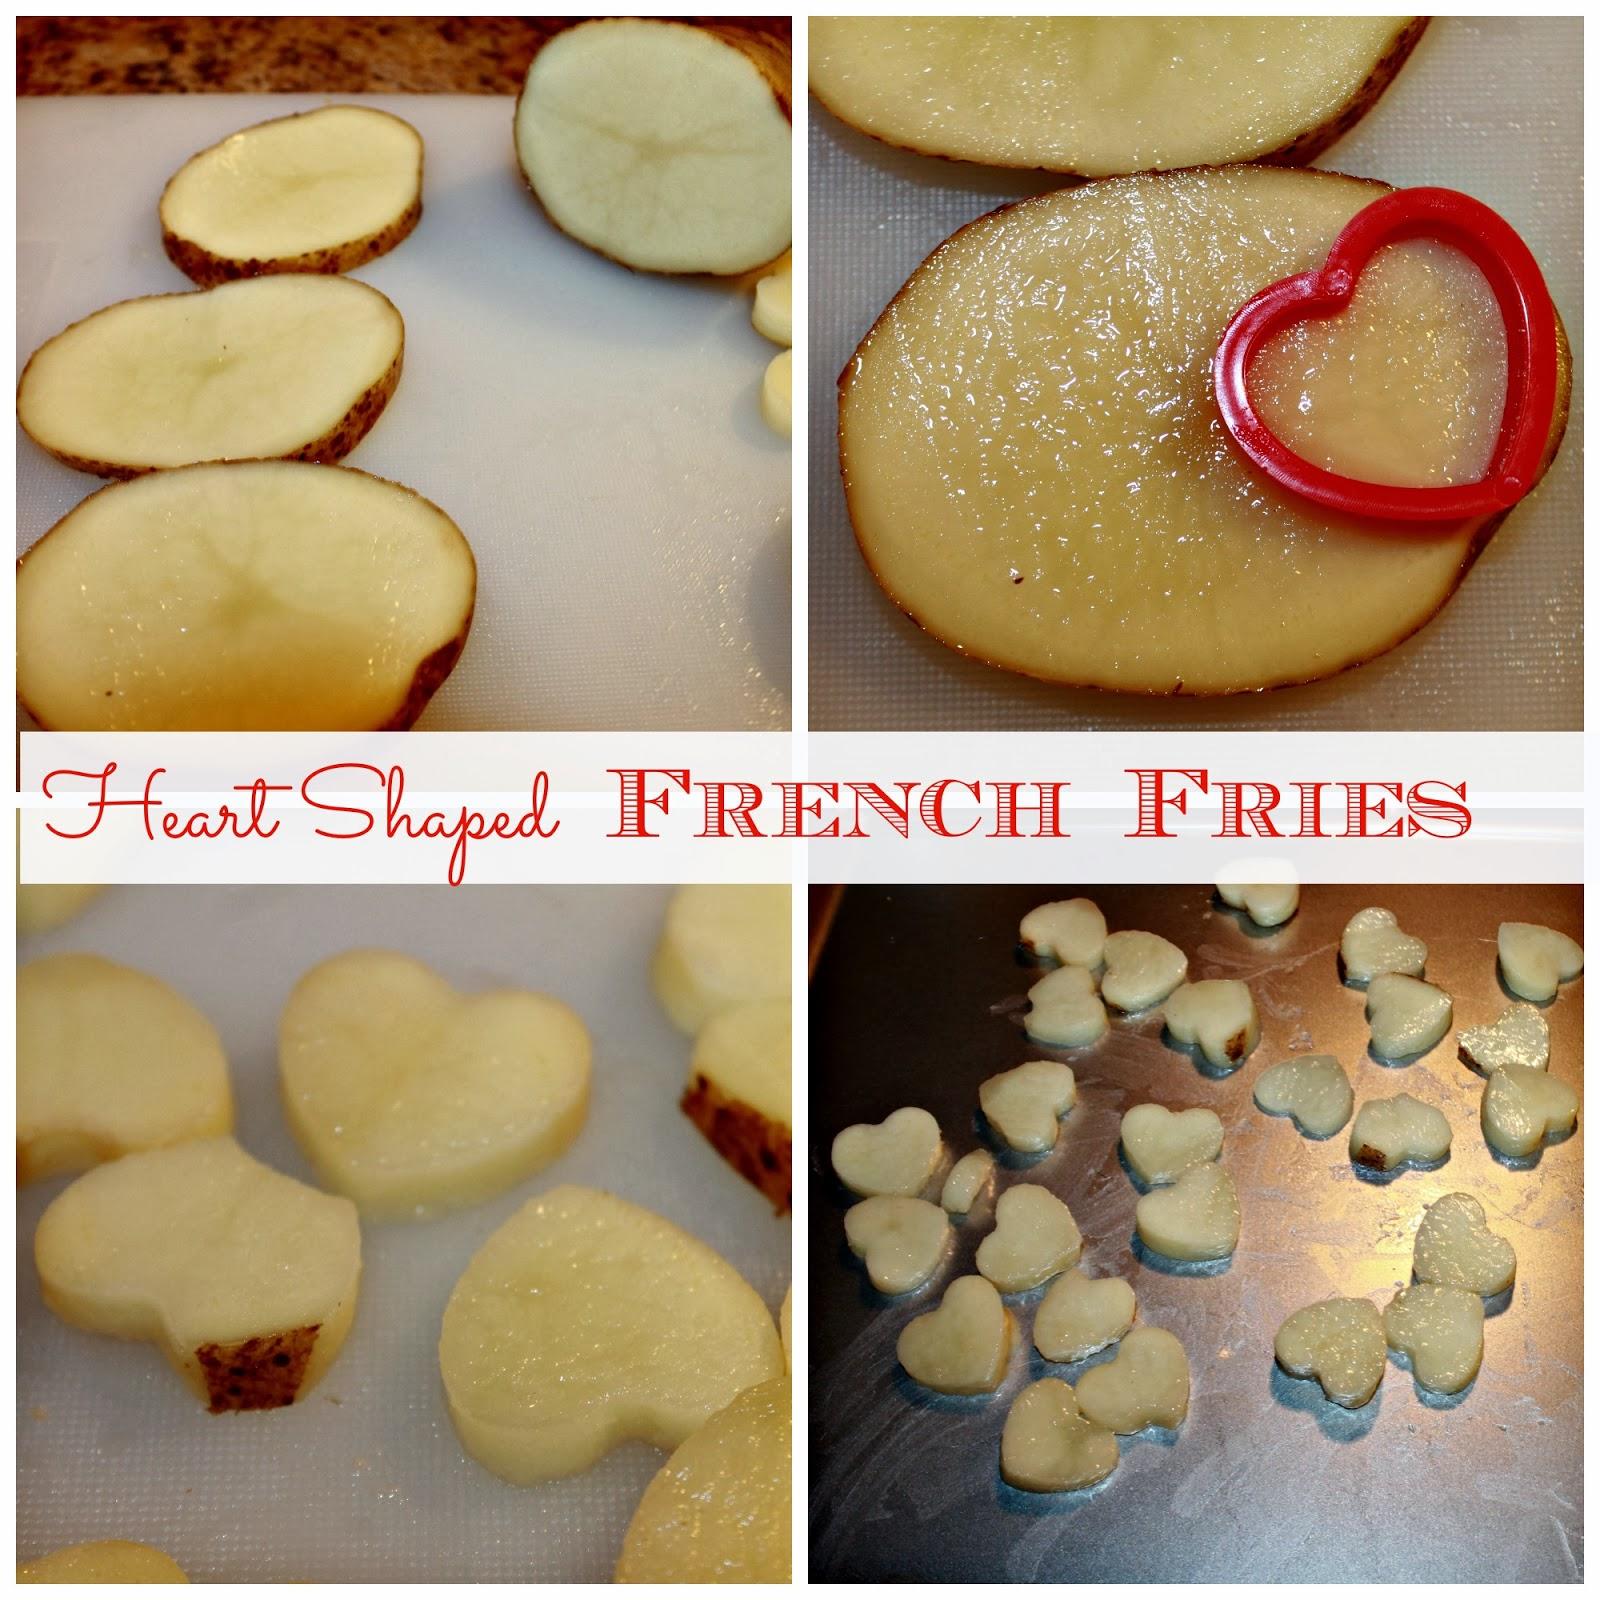 #ad Heart Shaped French Fry Recipe